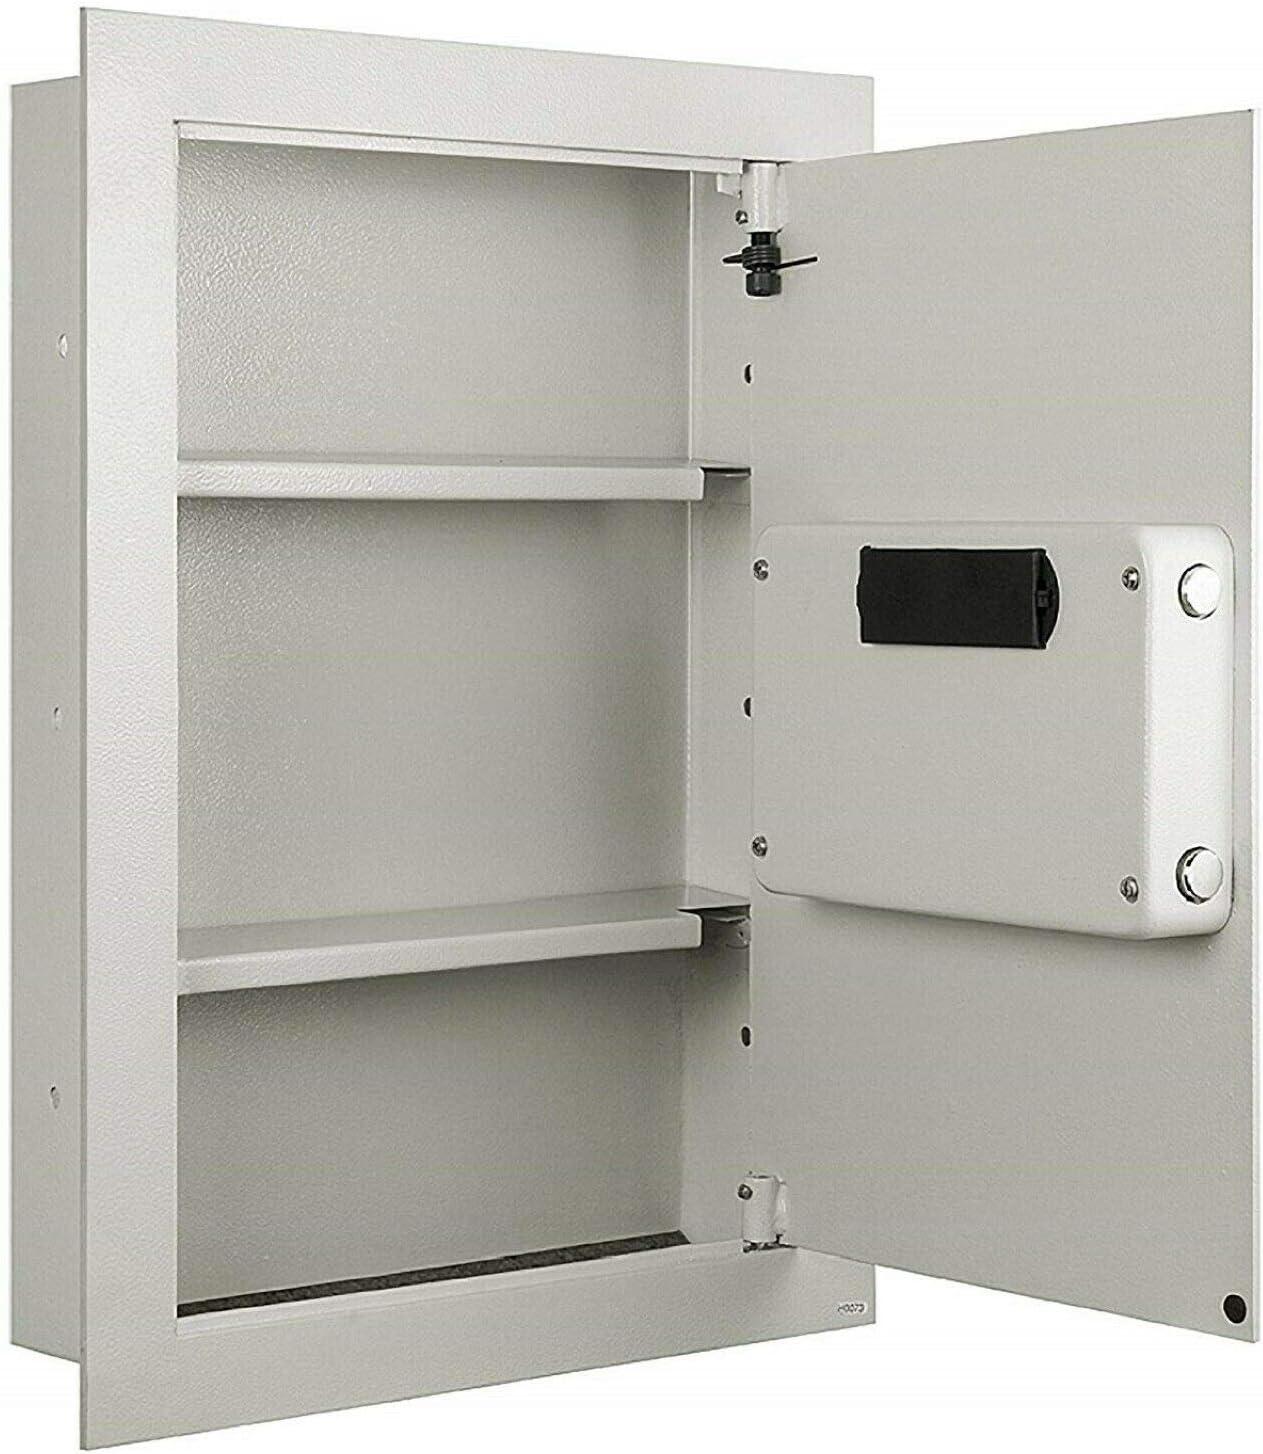 Large Hidden Wall Safe Electronic Security Jewelry Gun Cash Lock Box Fire Proof